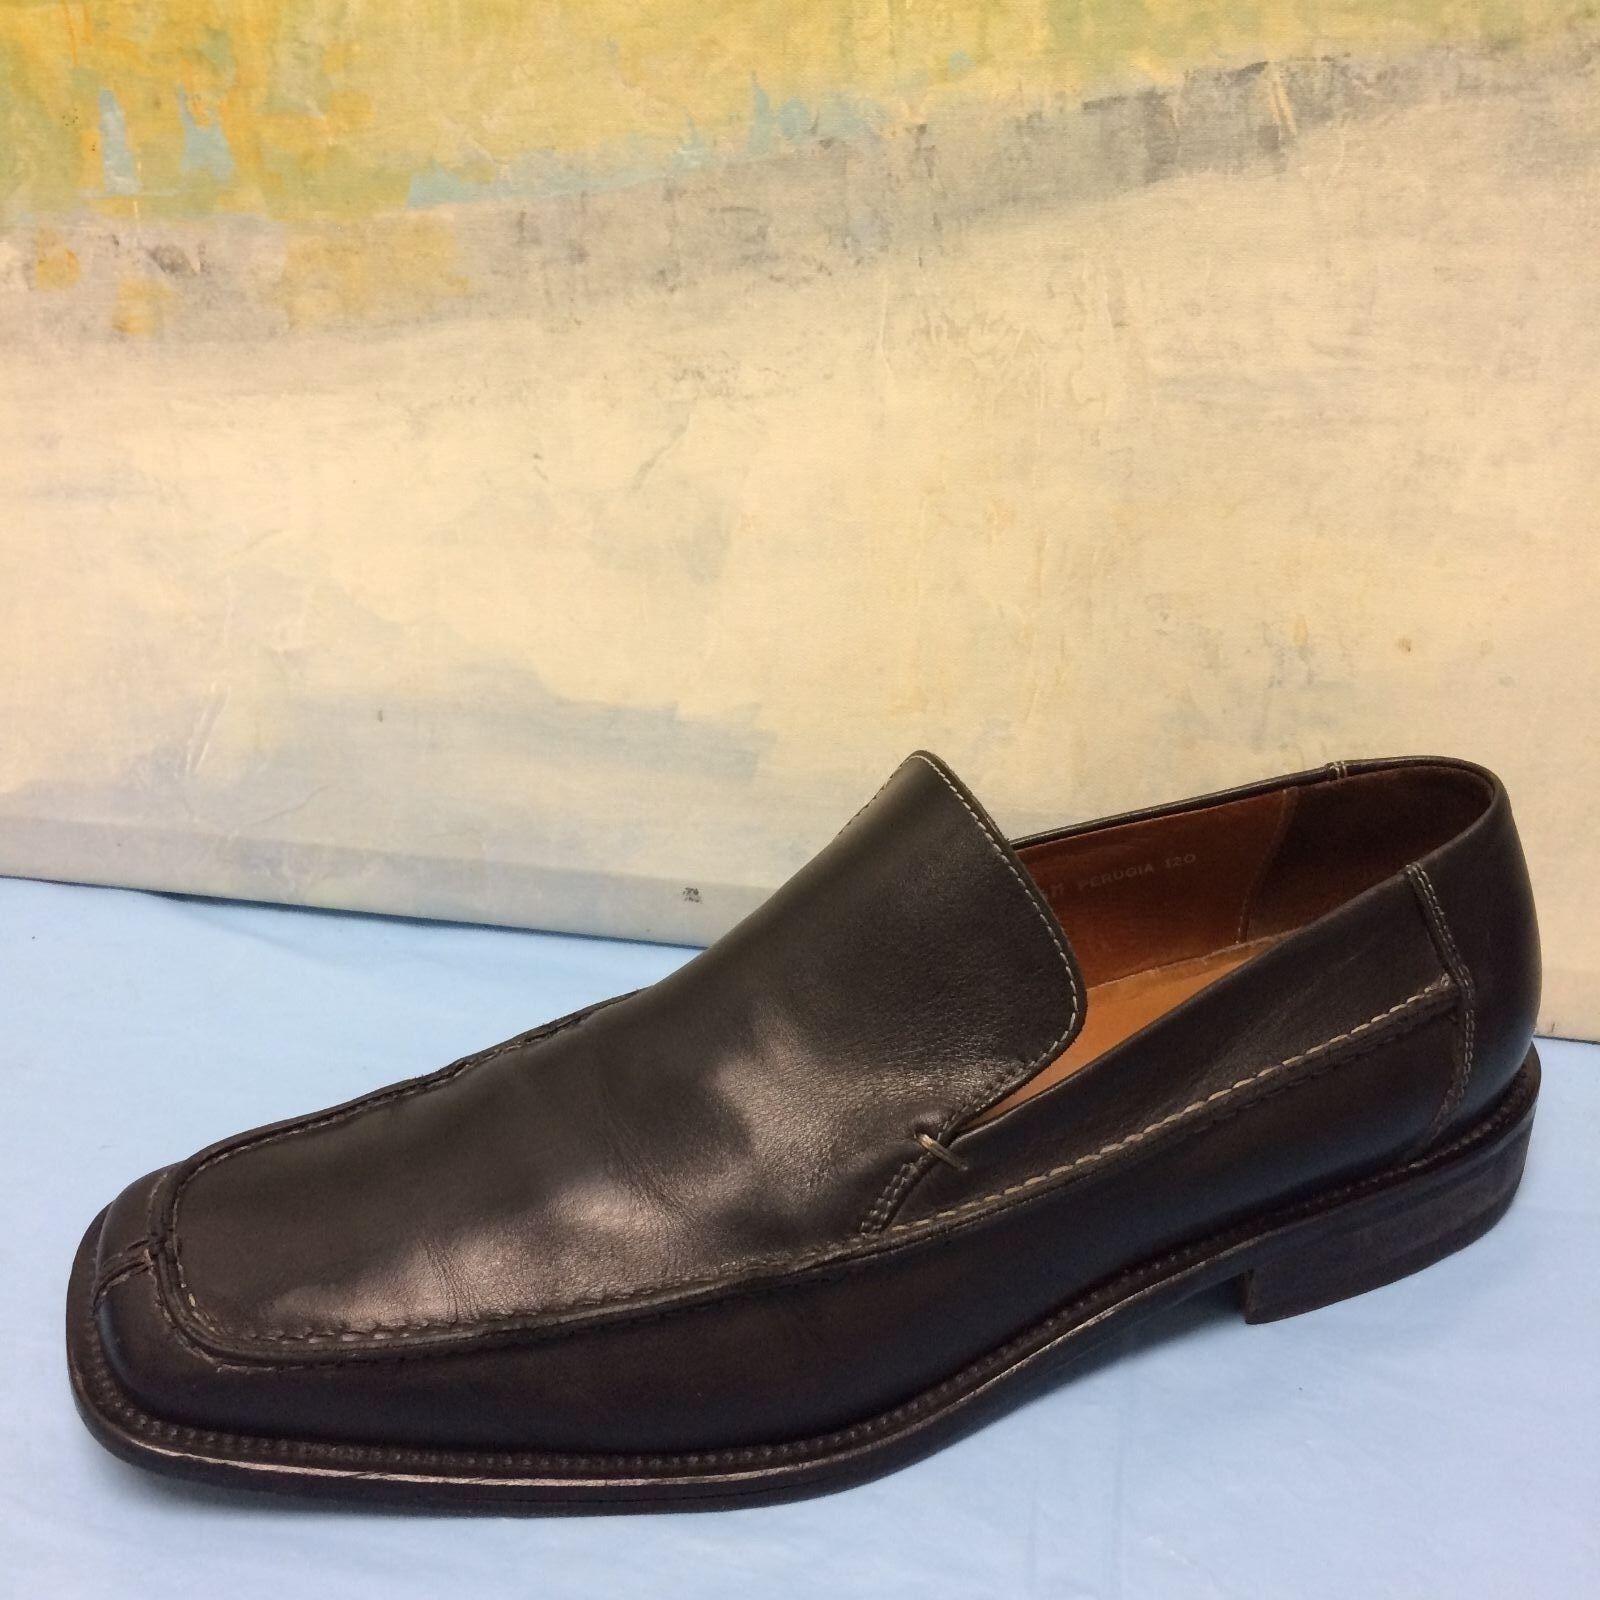 cc958a7492 DONALD J PLINER 120 Leather Loafers Sz 11.5 PERUGIA Black nnyhho1657 ...